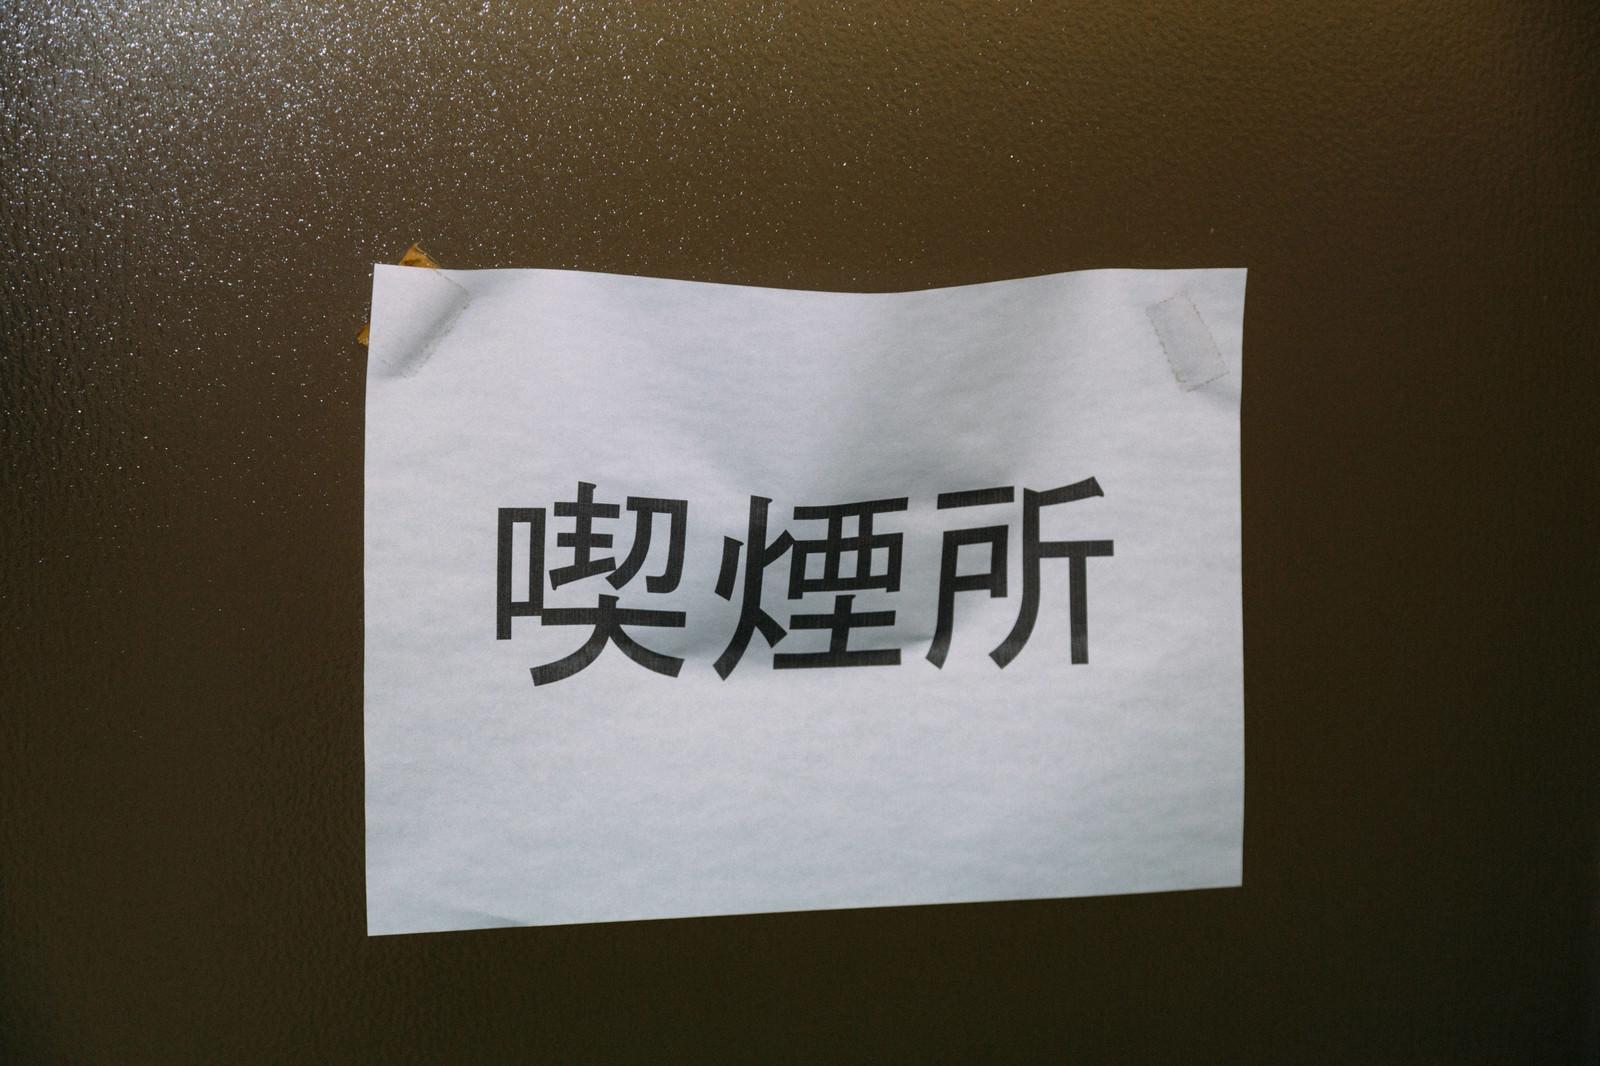 「A4のコピー用紙で貼られた喫煙所」の写真